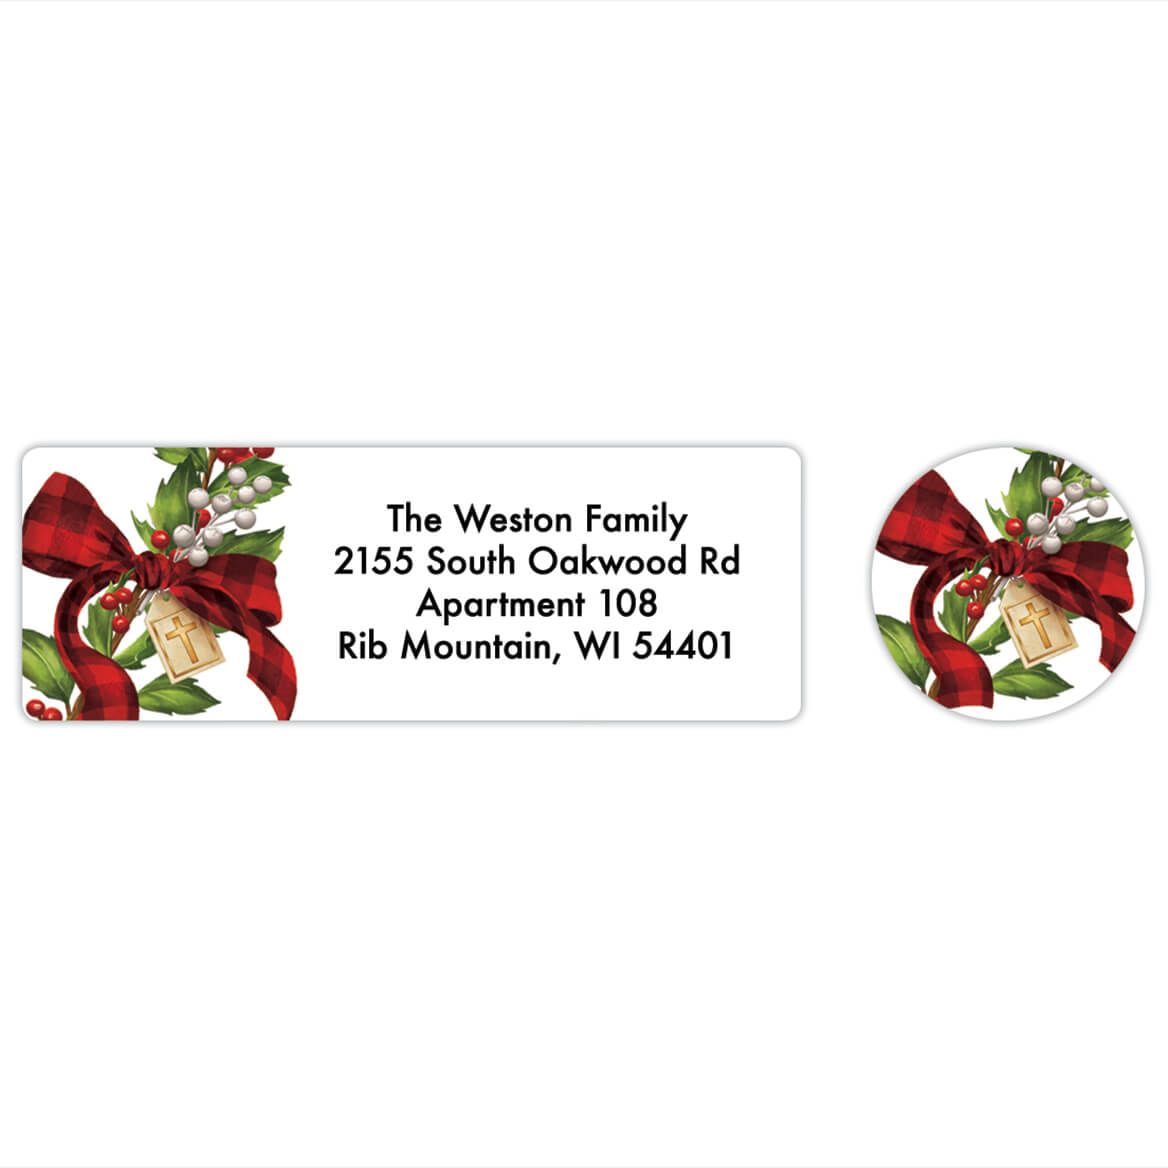 Personalized Friendship Blessings Labels & Envelope Seals 20-368264